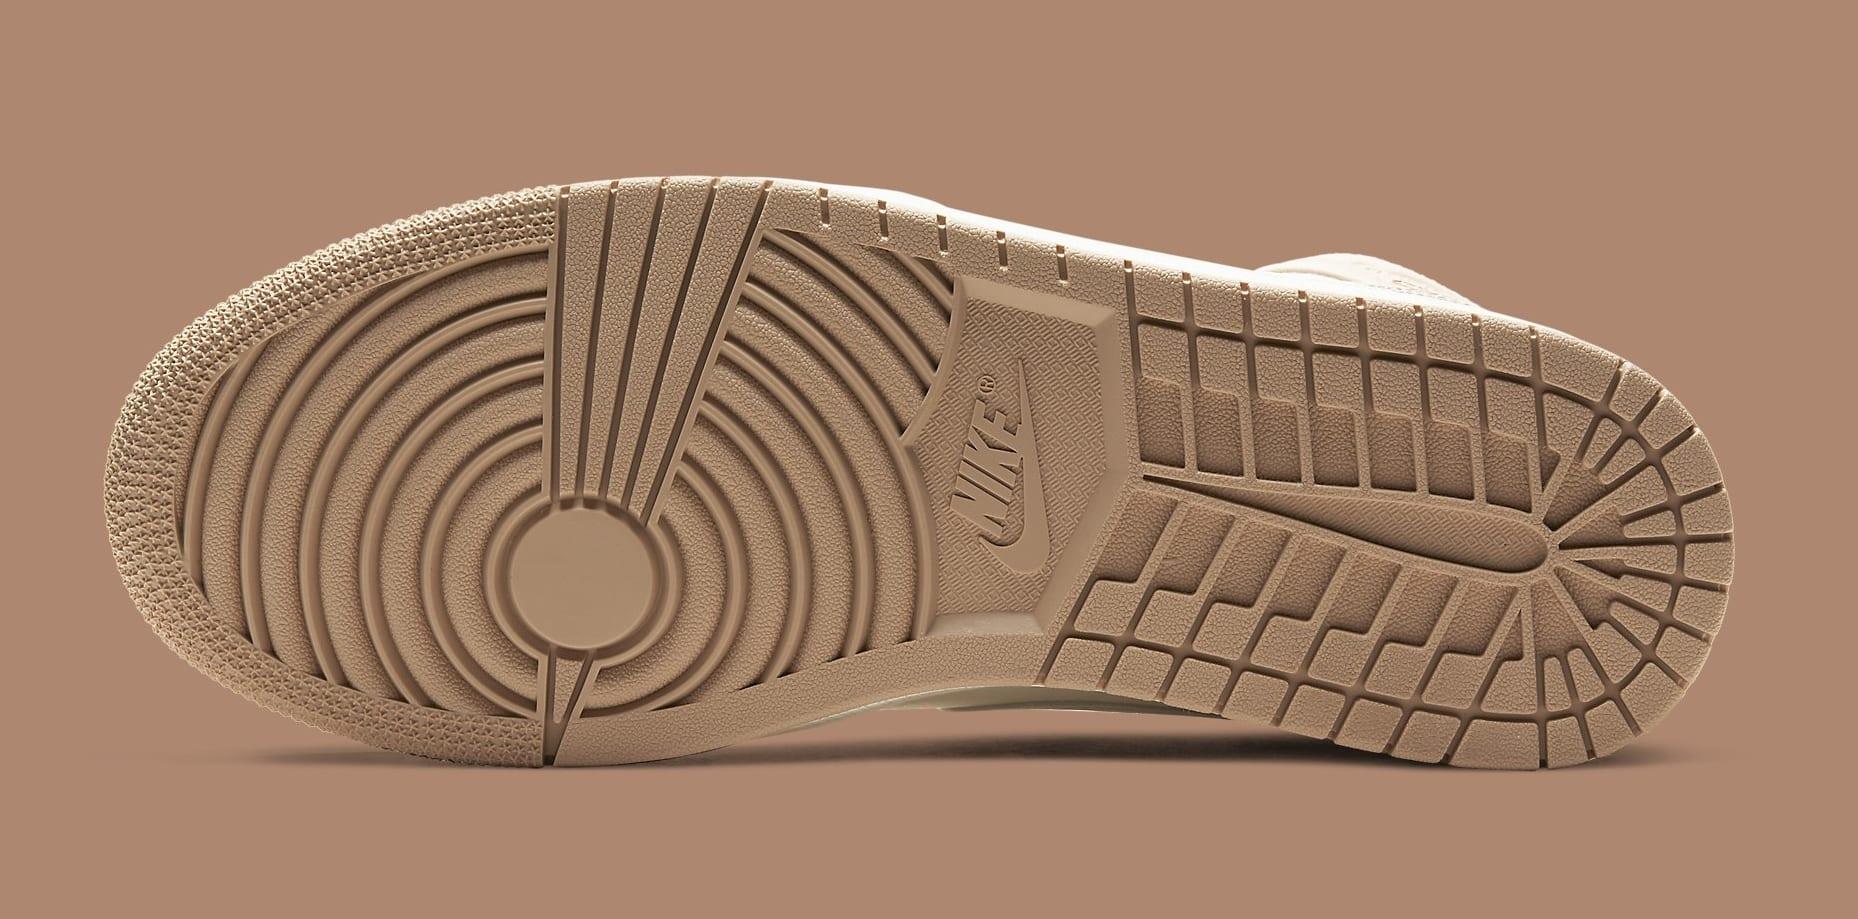 Air Jordan 1 Mid Milan Release Date Cv3044 100 Sole Collector